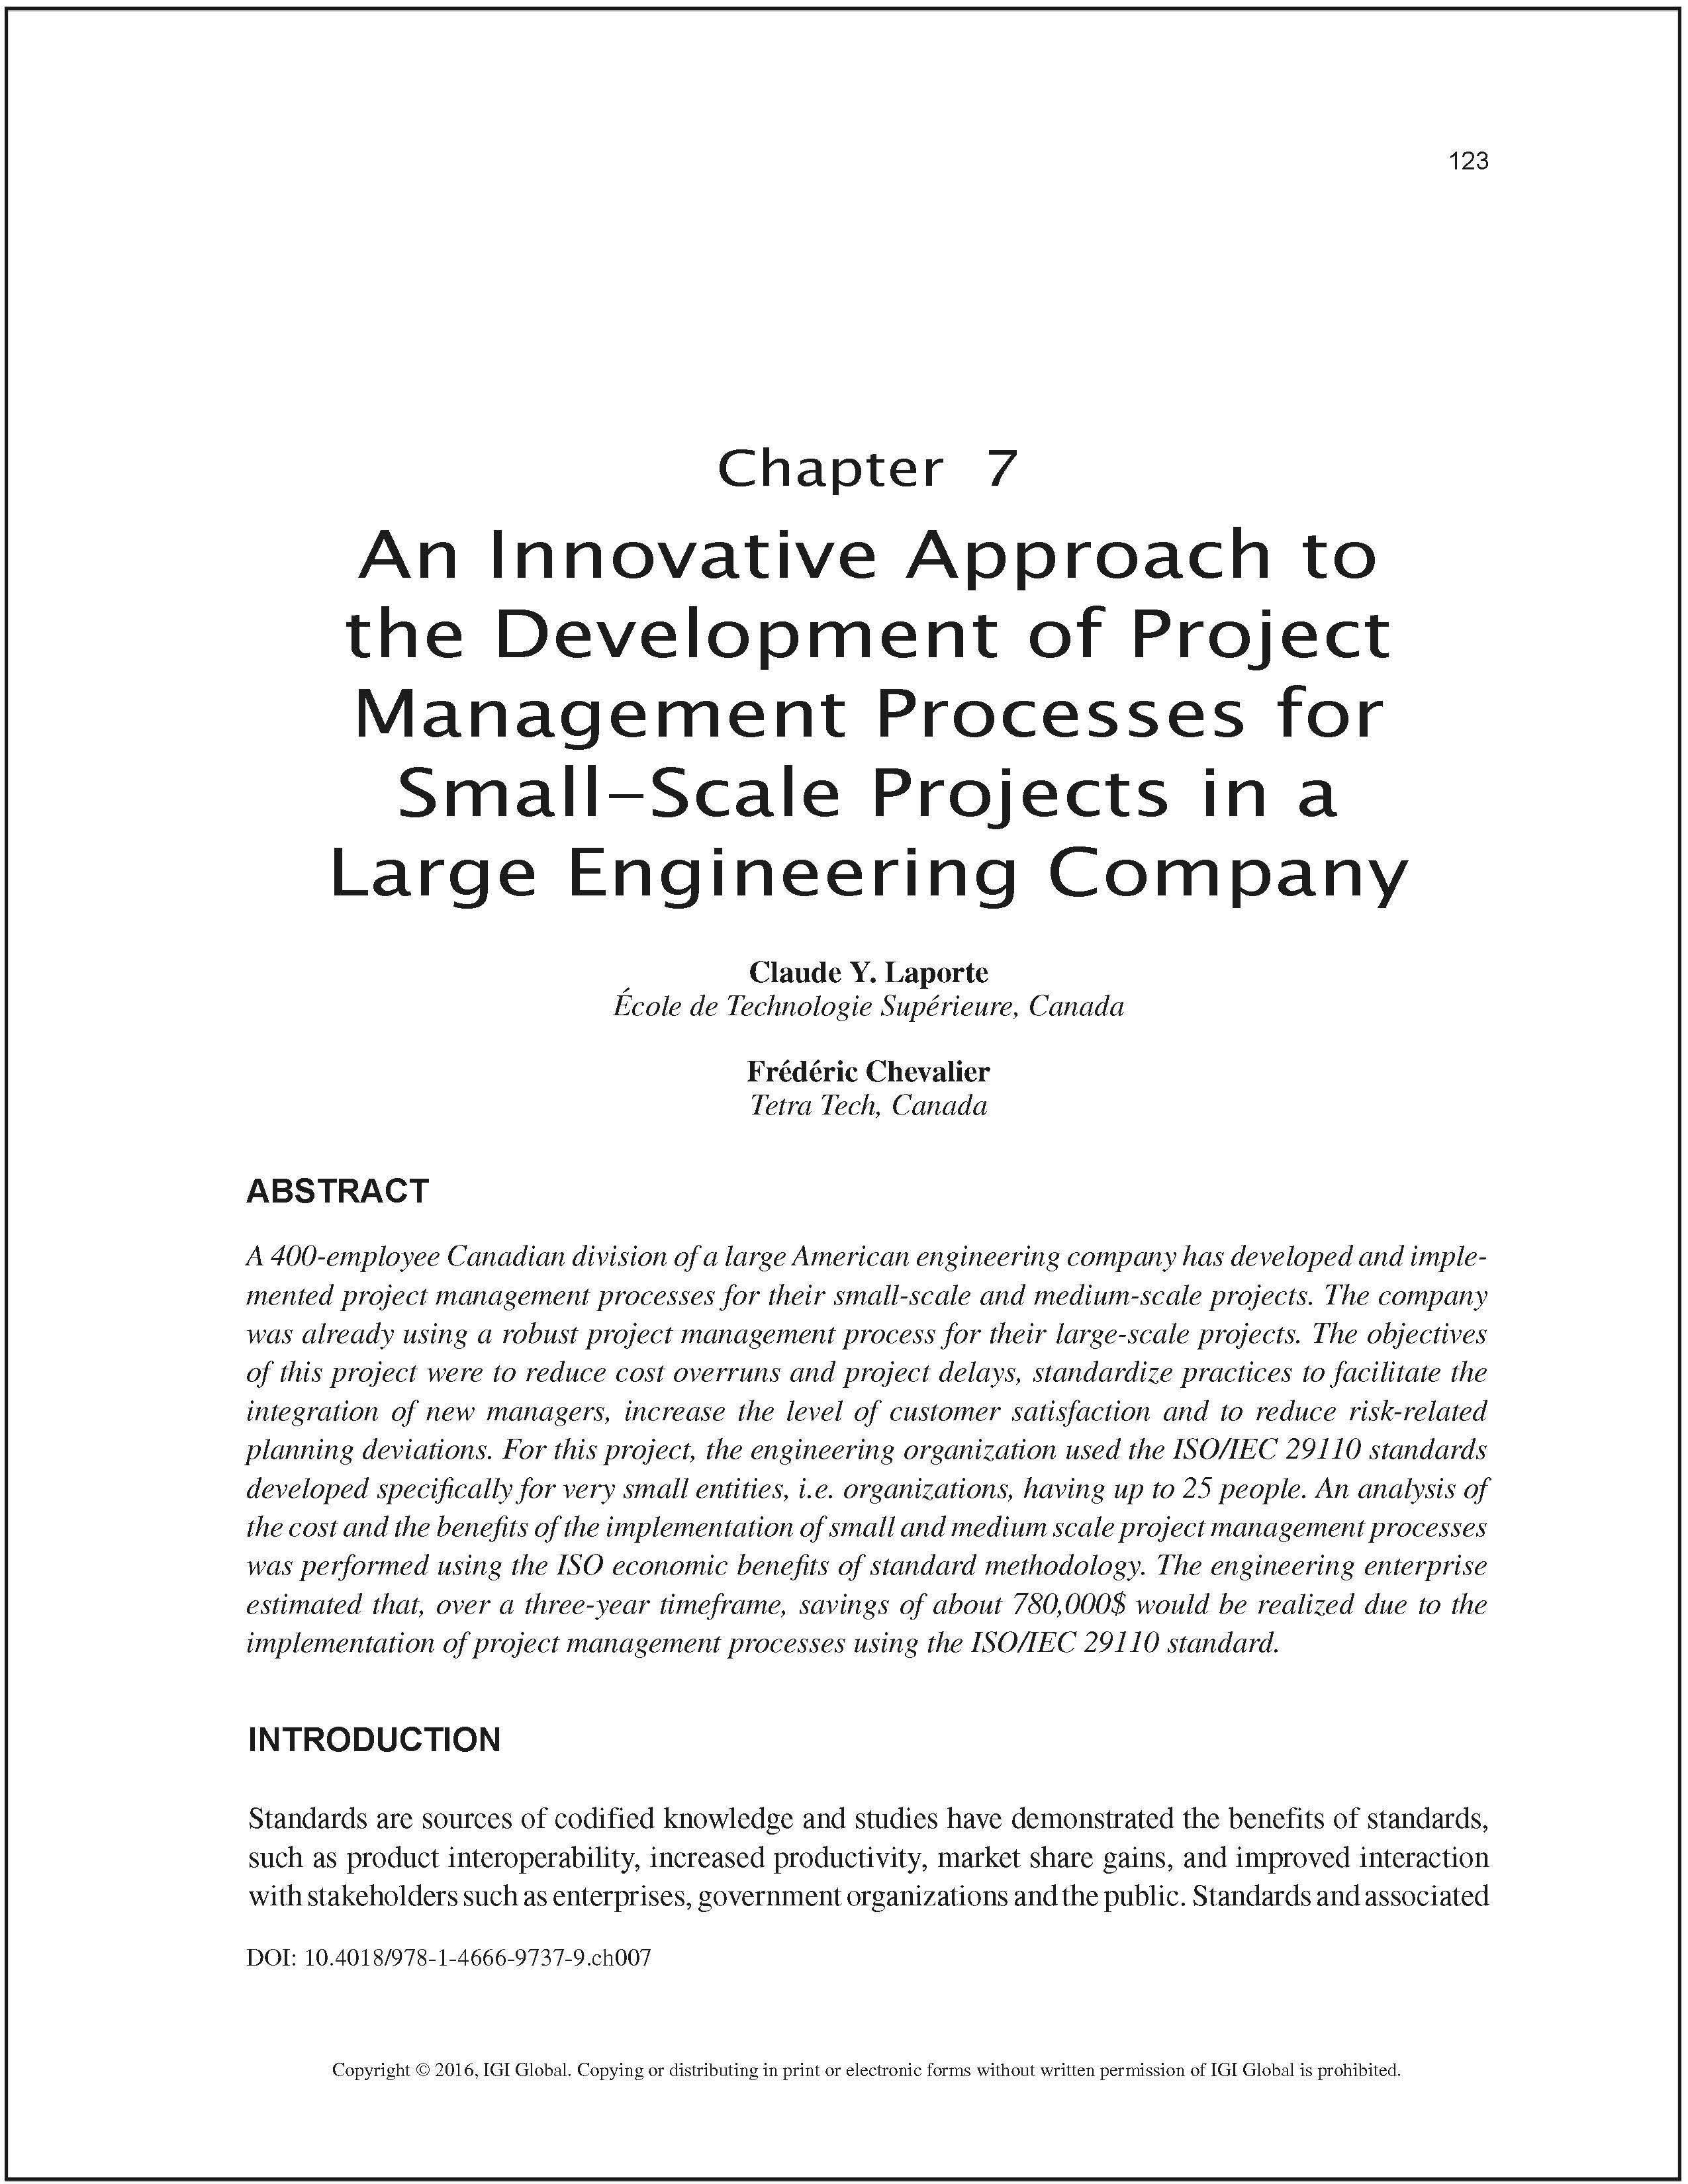 co evolution of st andards in innovation systems grsser stefan n